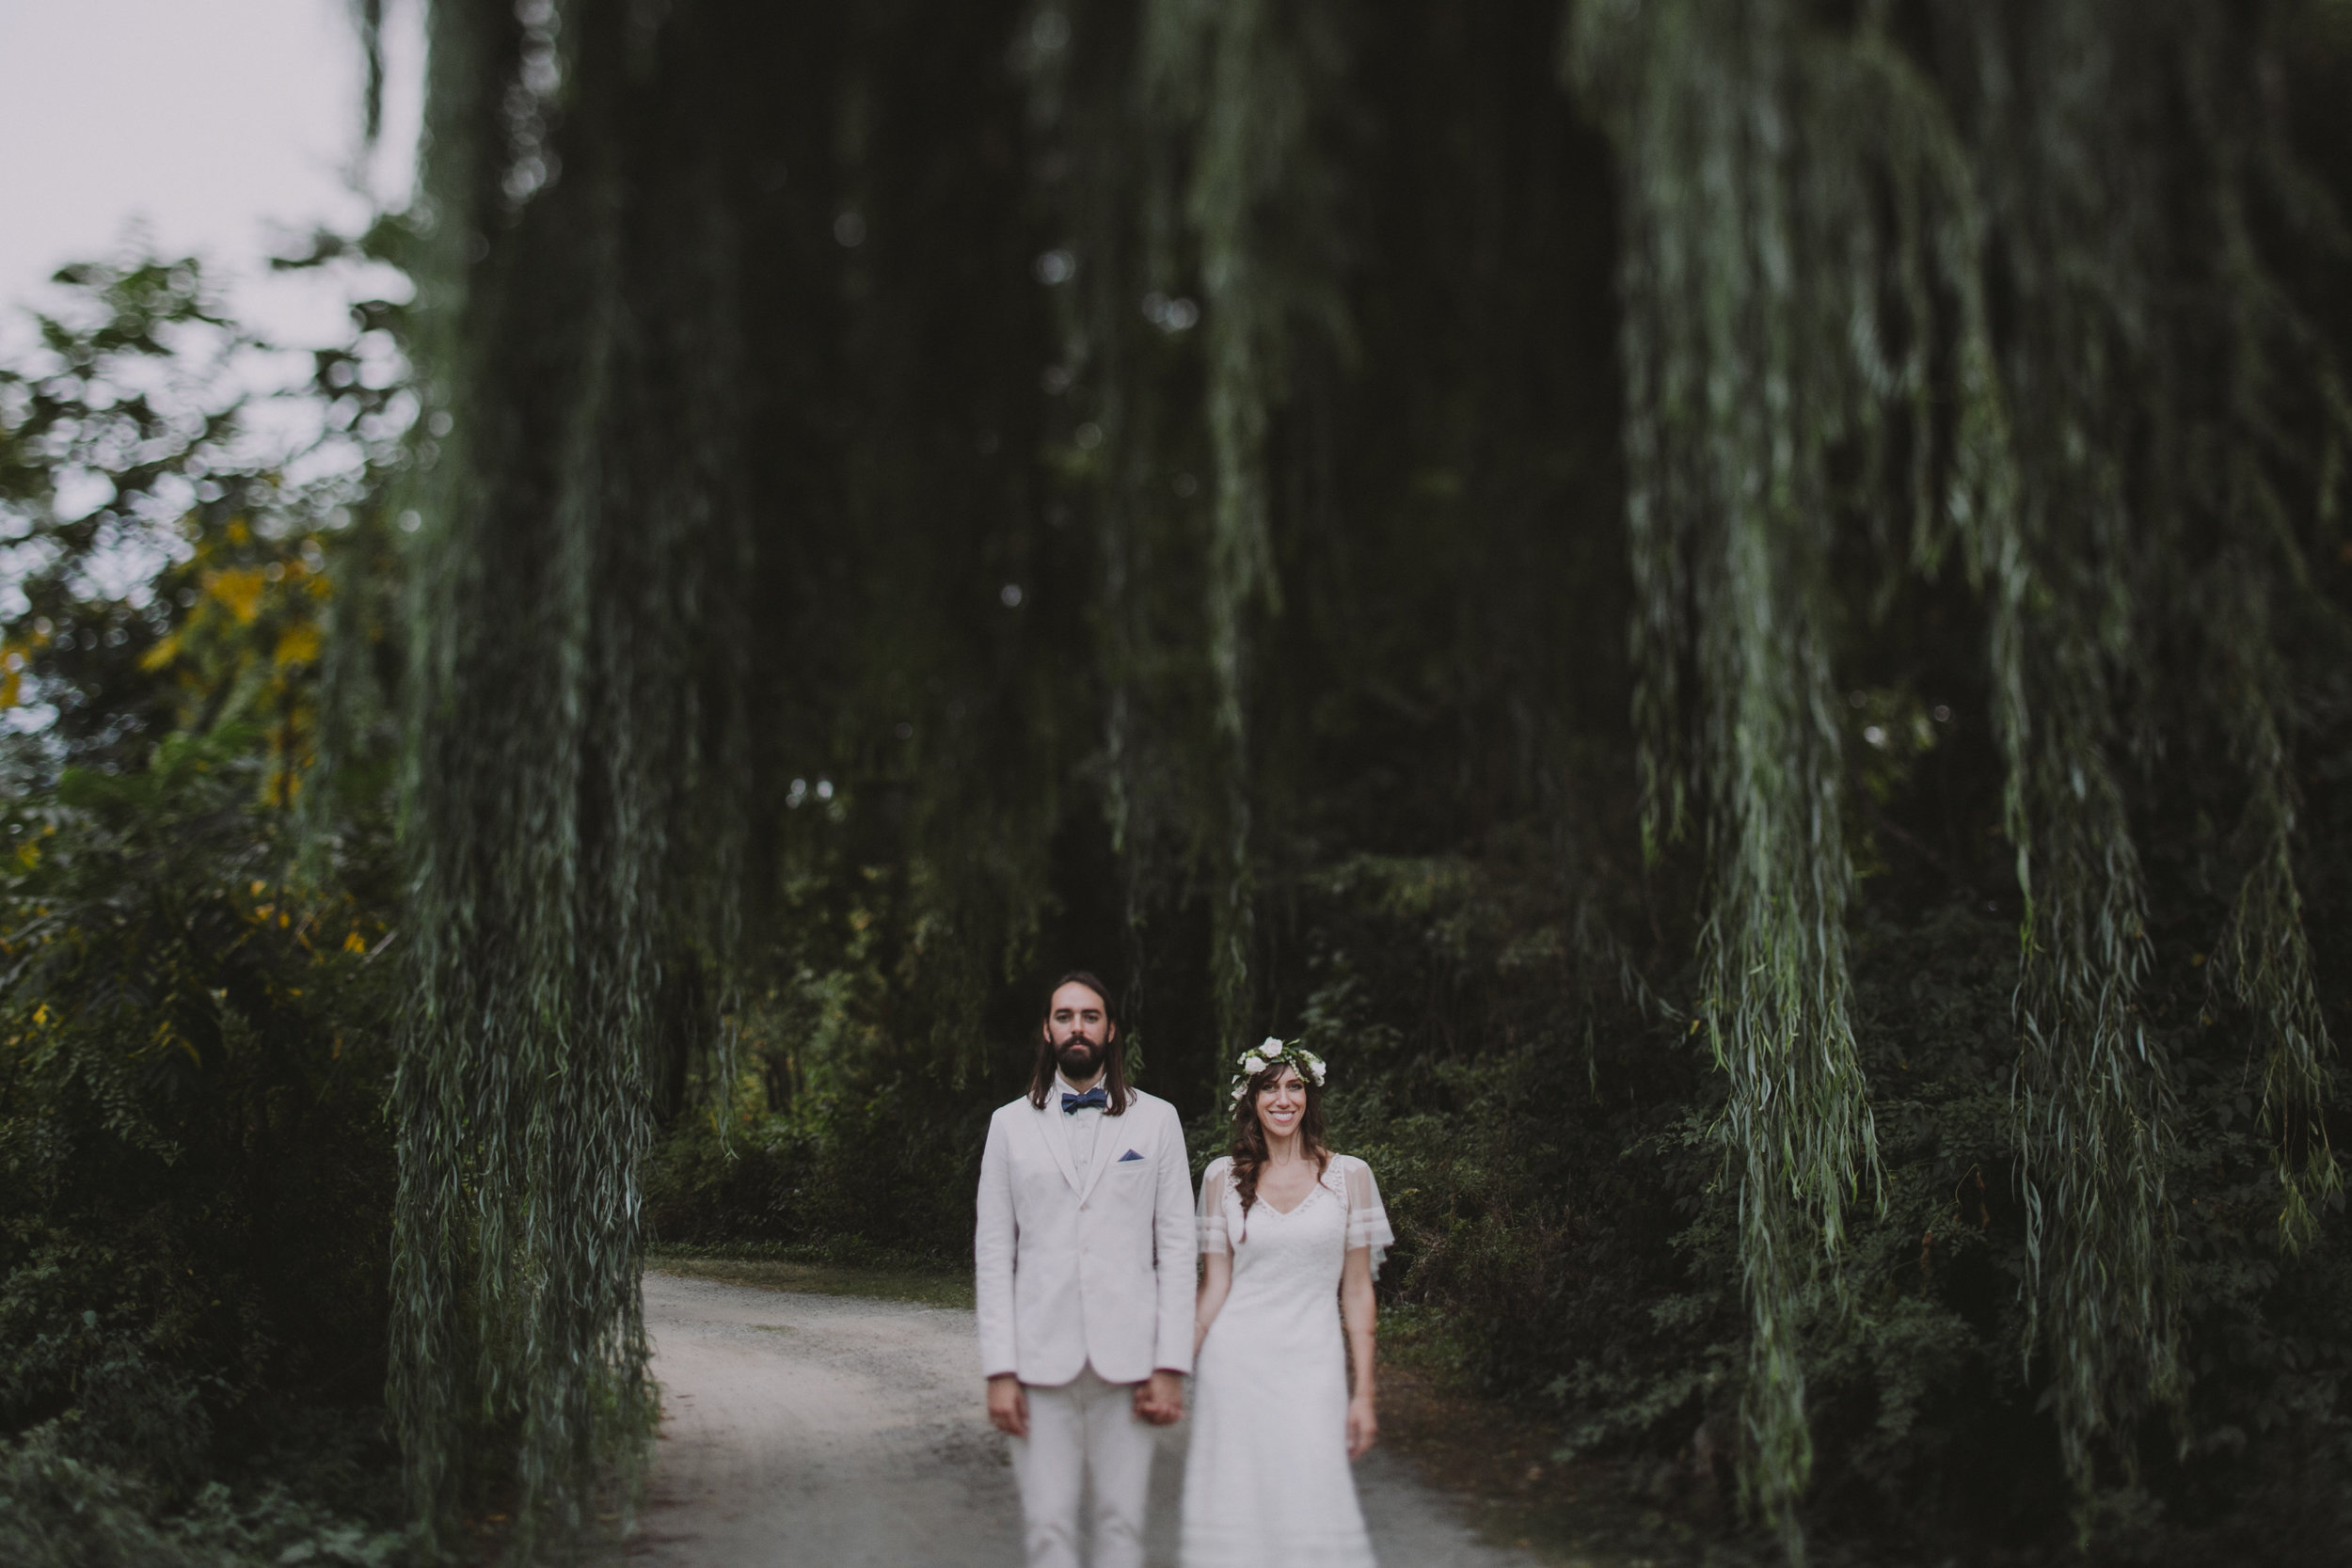 LIBERTY_VIEW_FARM_HIGHLAND_NY_WEDDING_CHELLISE_MICHAEL_PHOTOGRAPHY854.JPG